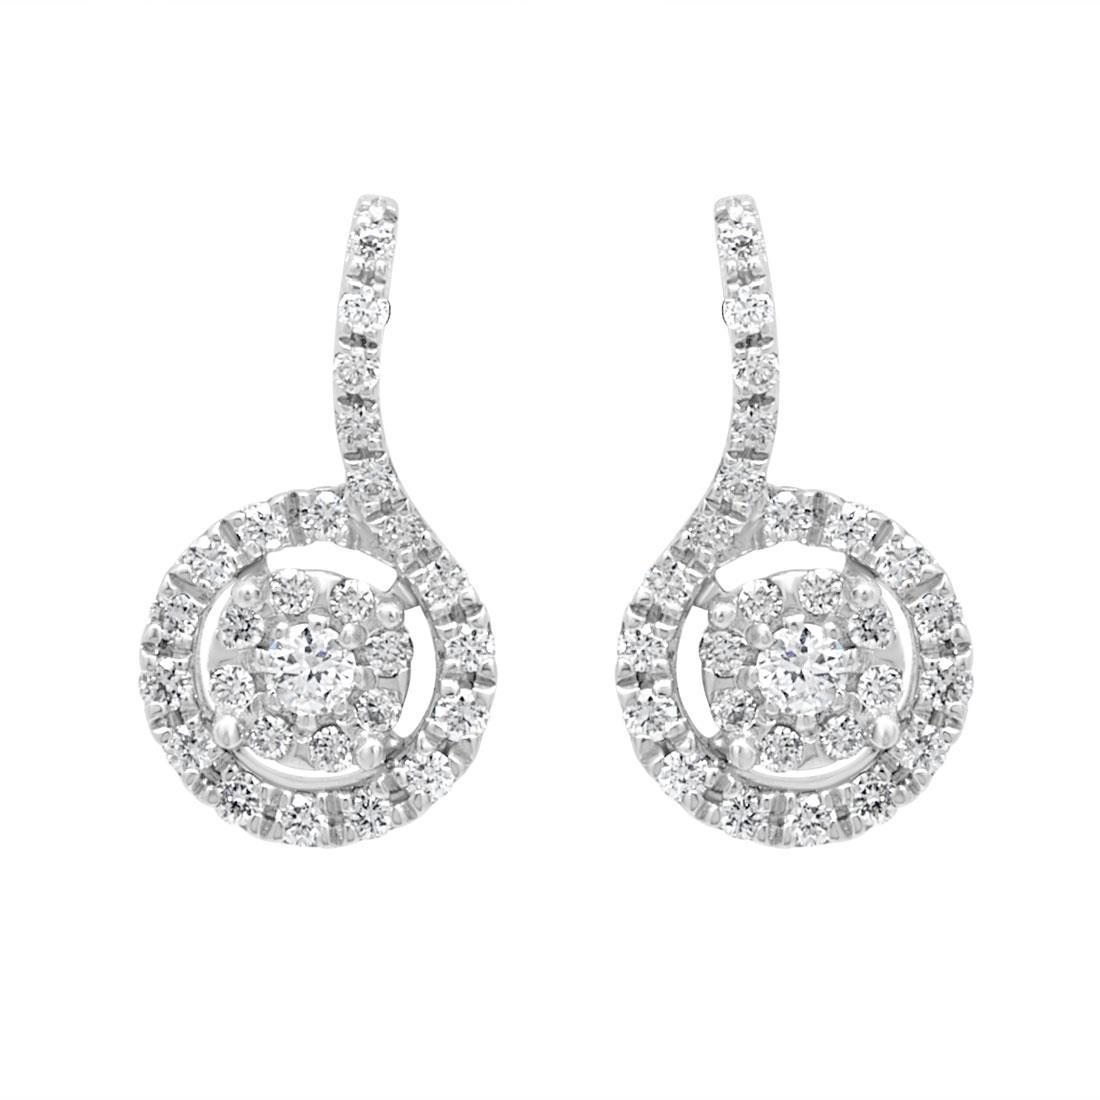 0.30 ct diamond pavé earrings - BLISS